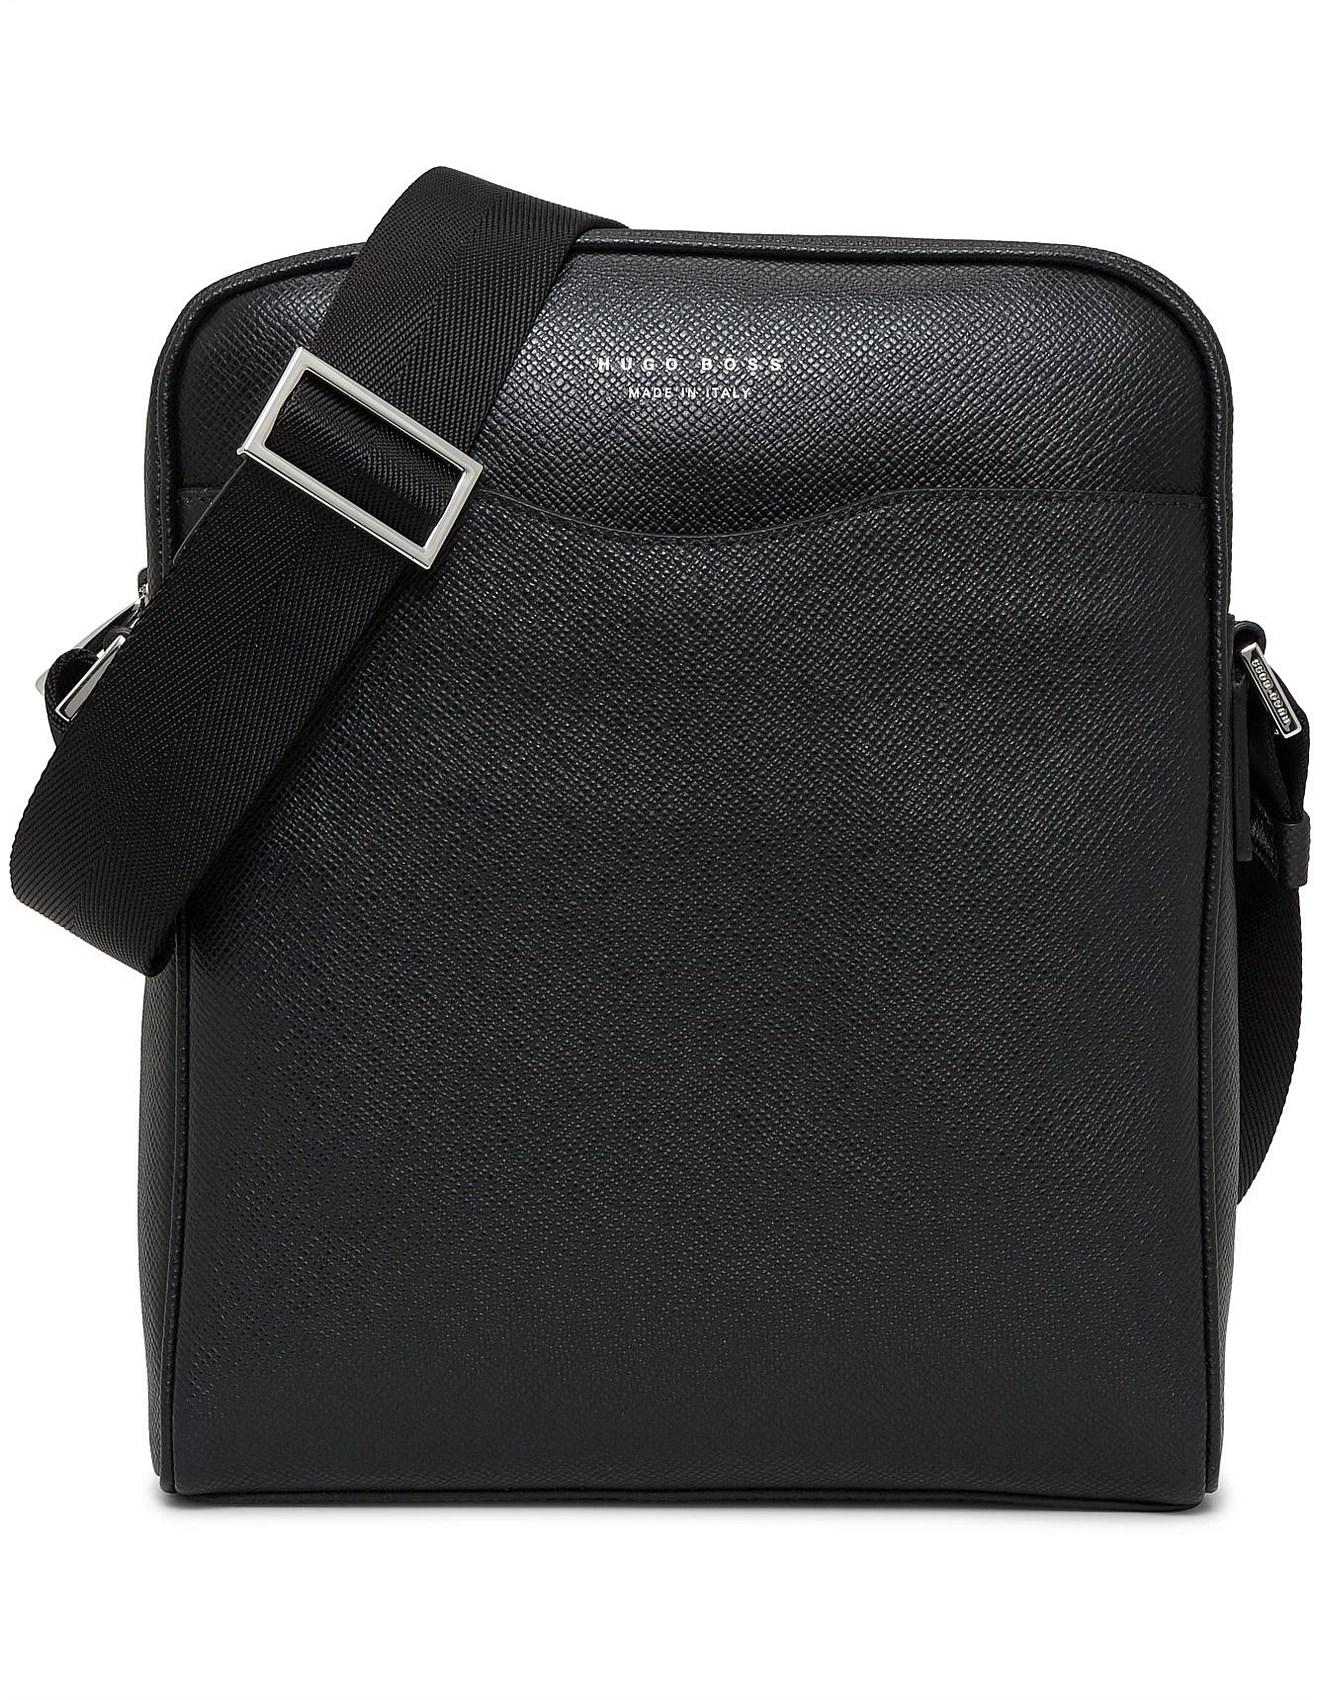 Signature Leather Crossbody Bag 5c4b69304ee20